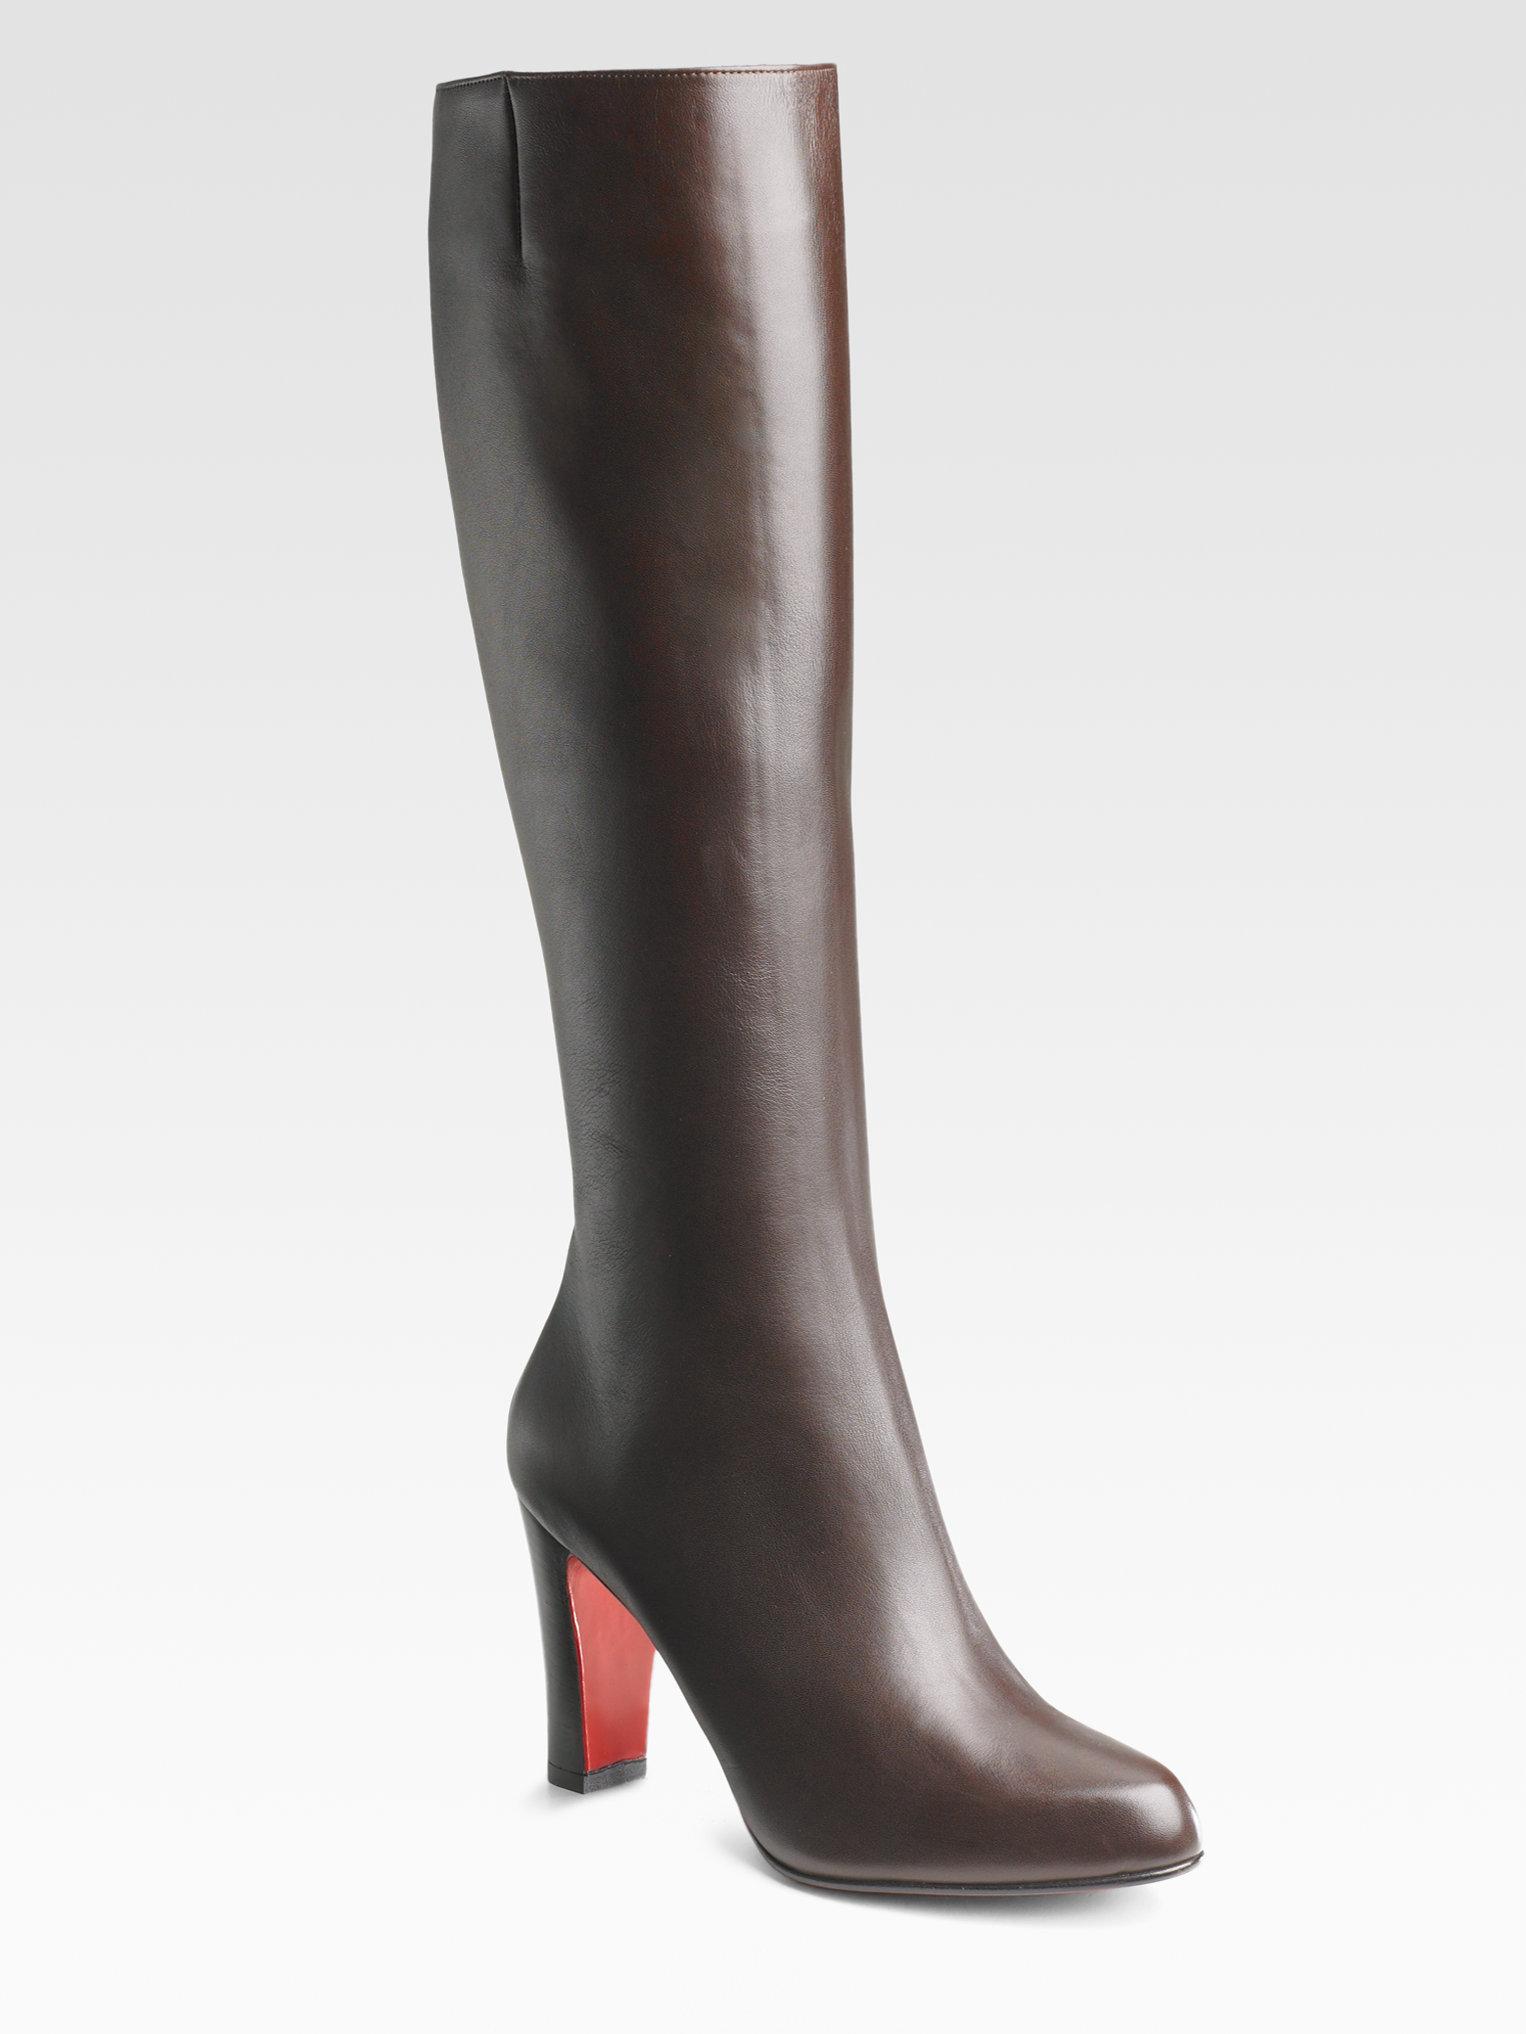 Artesur ? christian louboutin leather boots Brown silver-tone chain